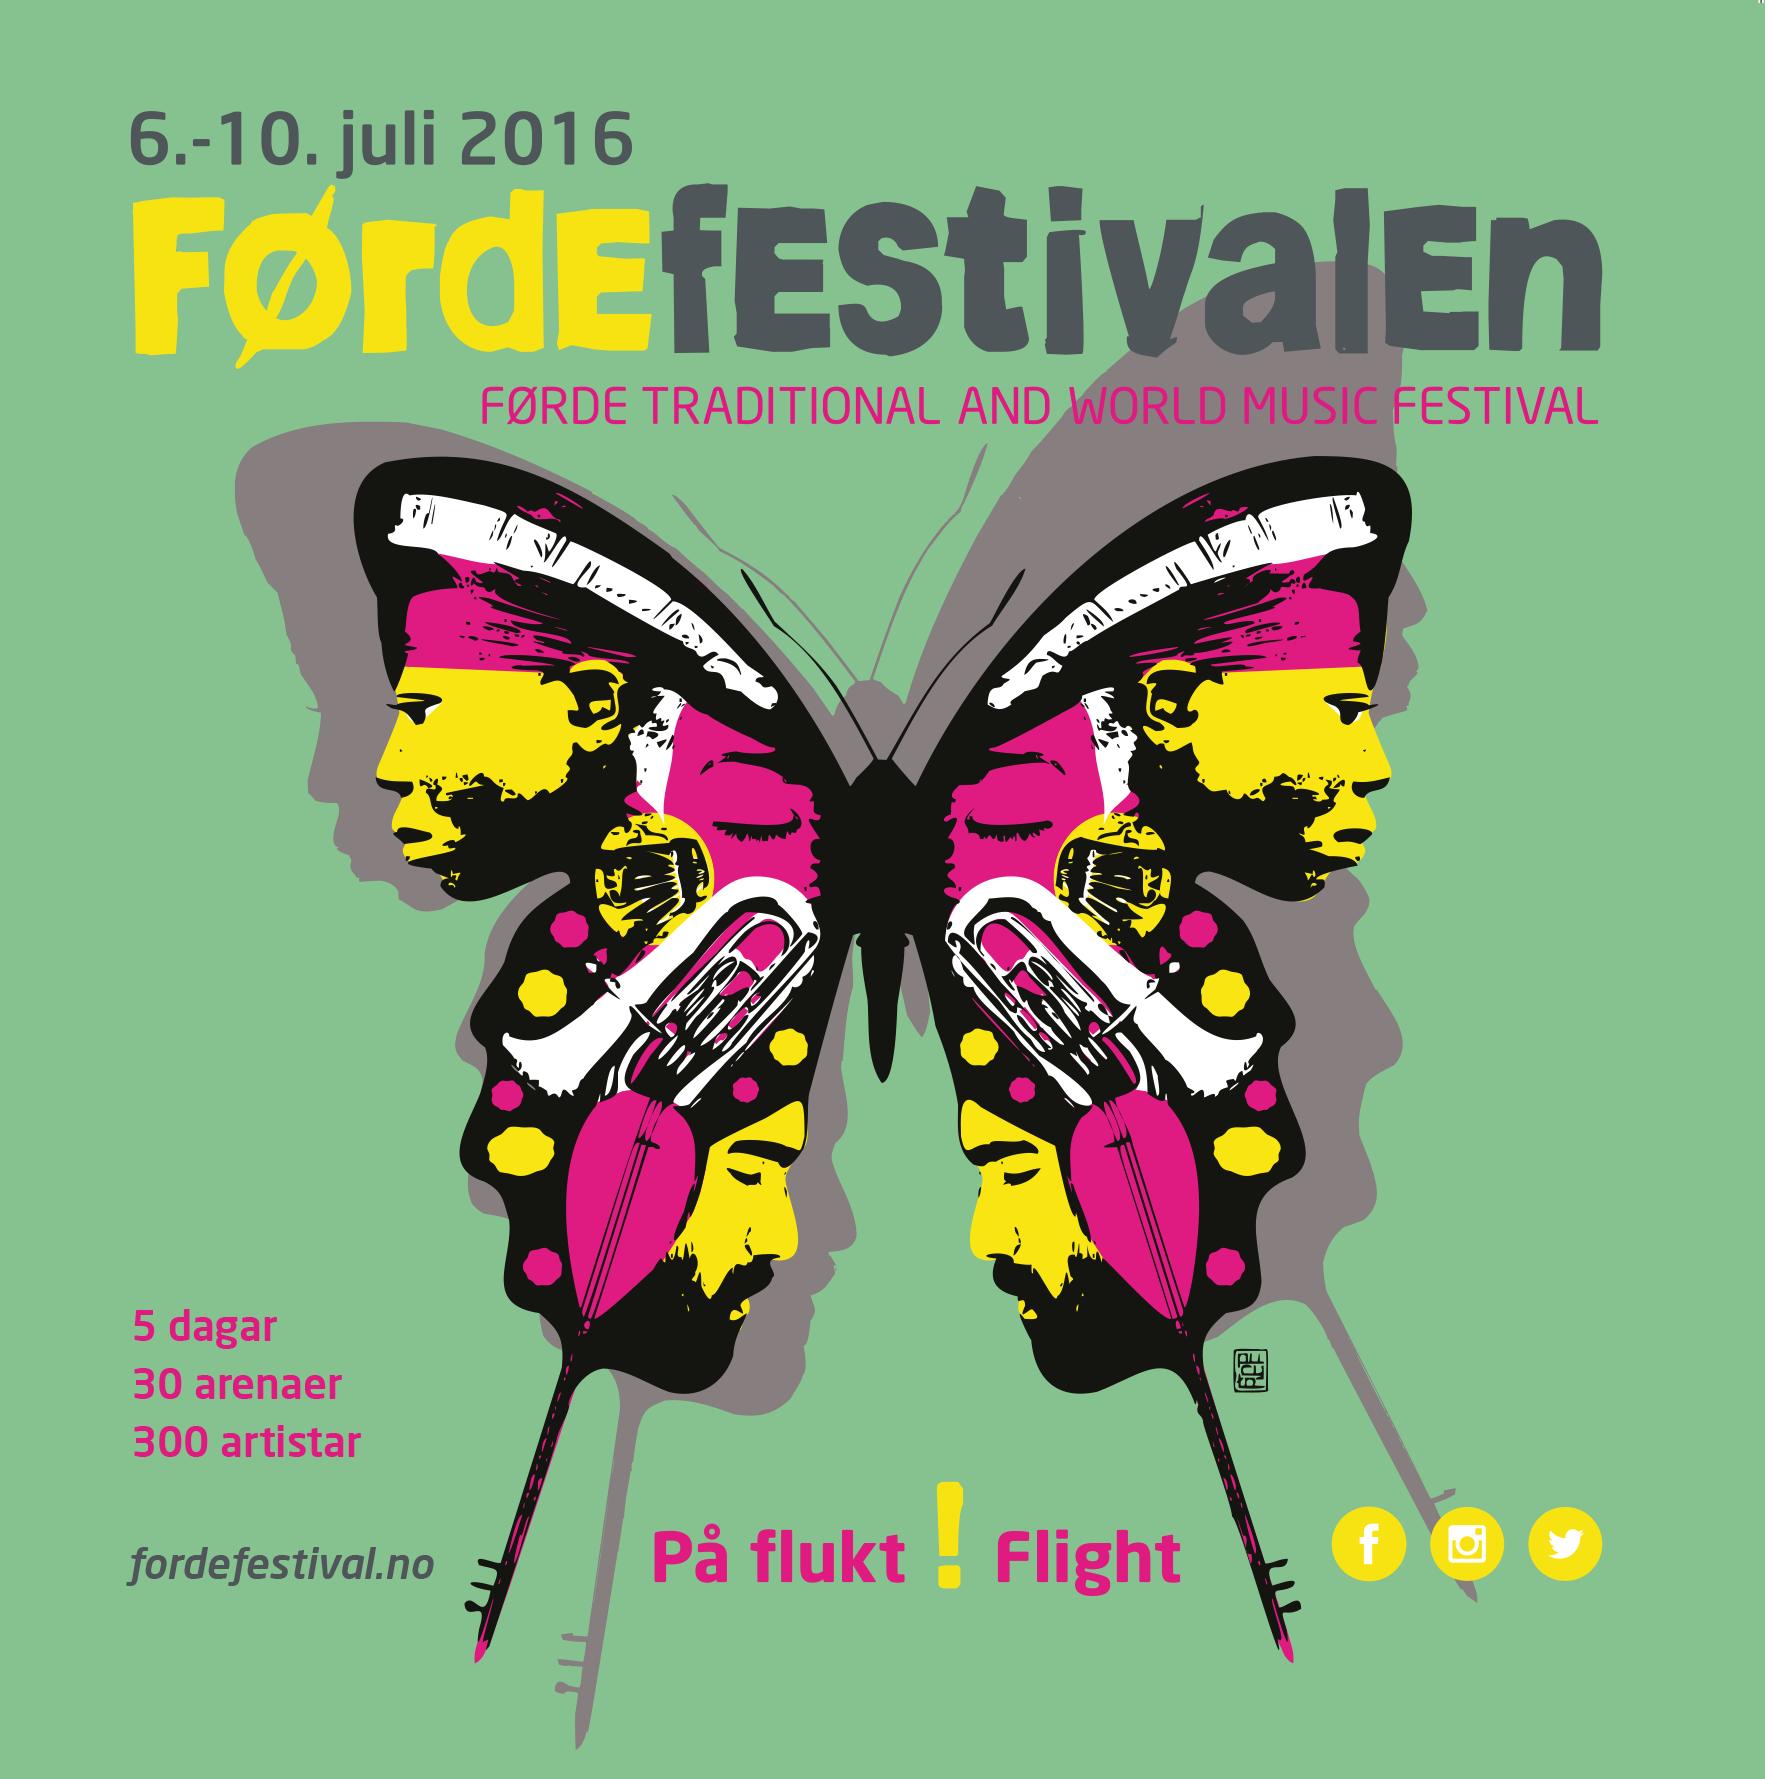 Festivalkatalog